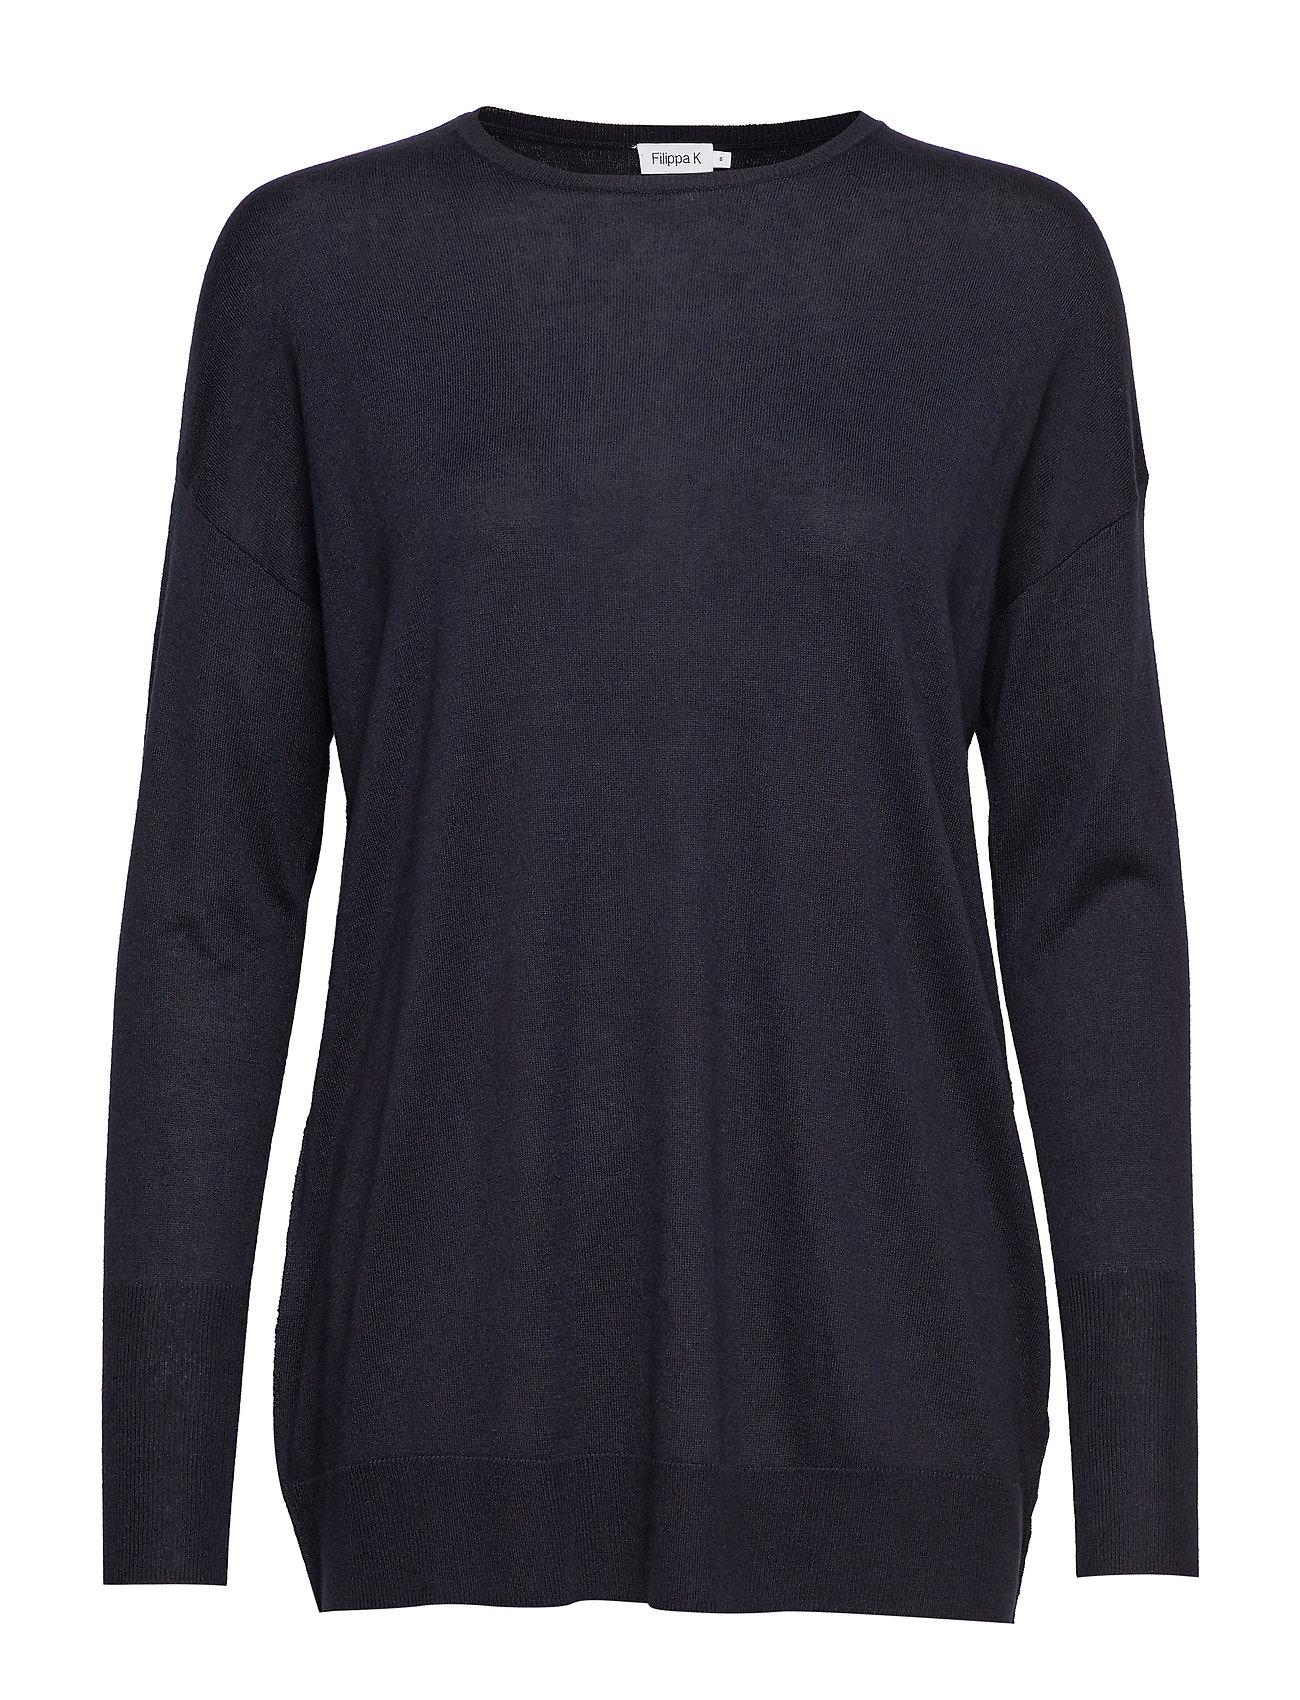 Filippa K Silky Fine Knit Sweater - NAVY